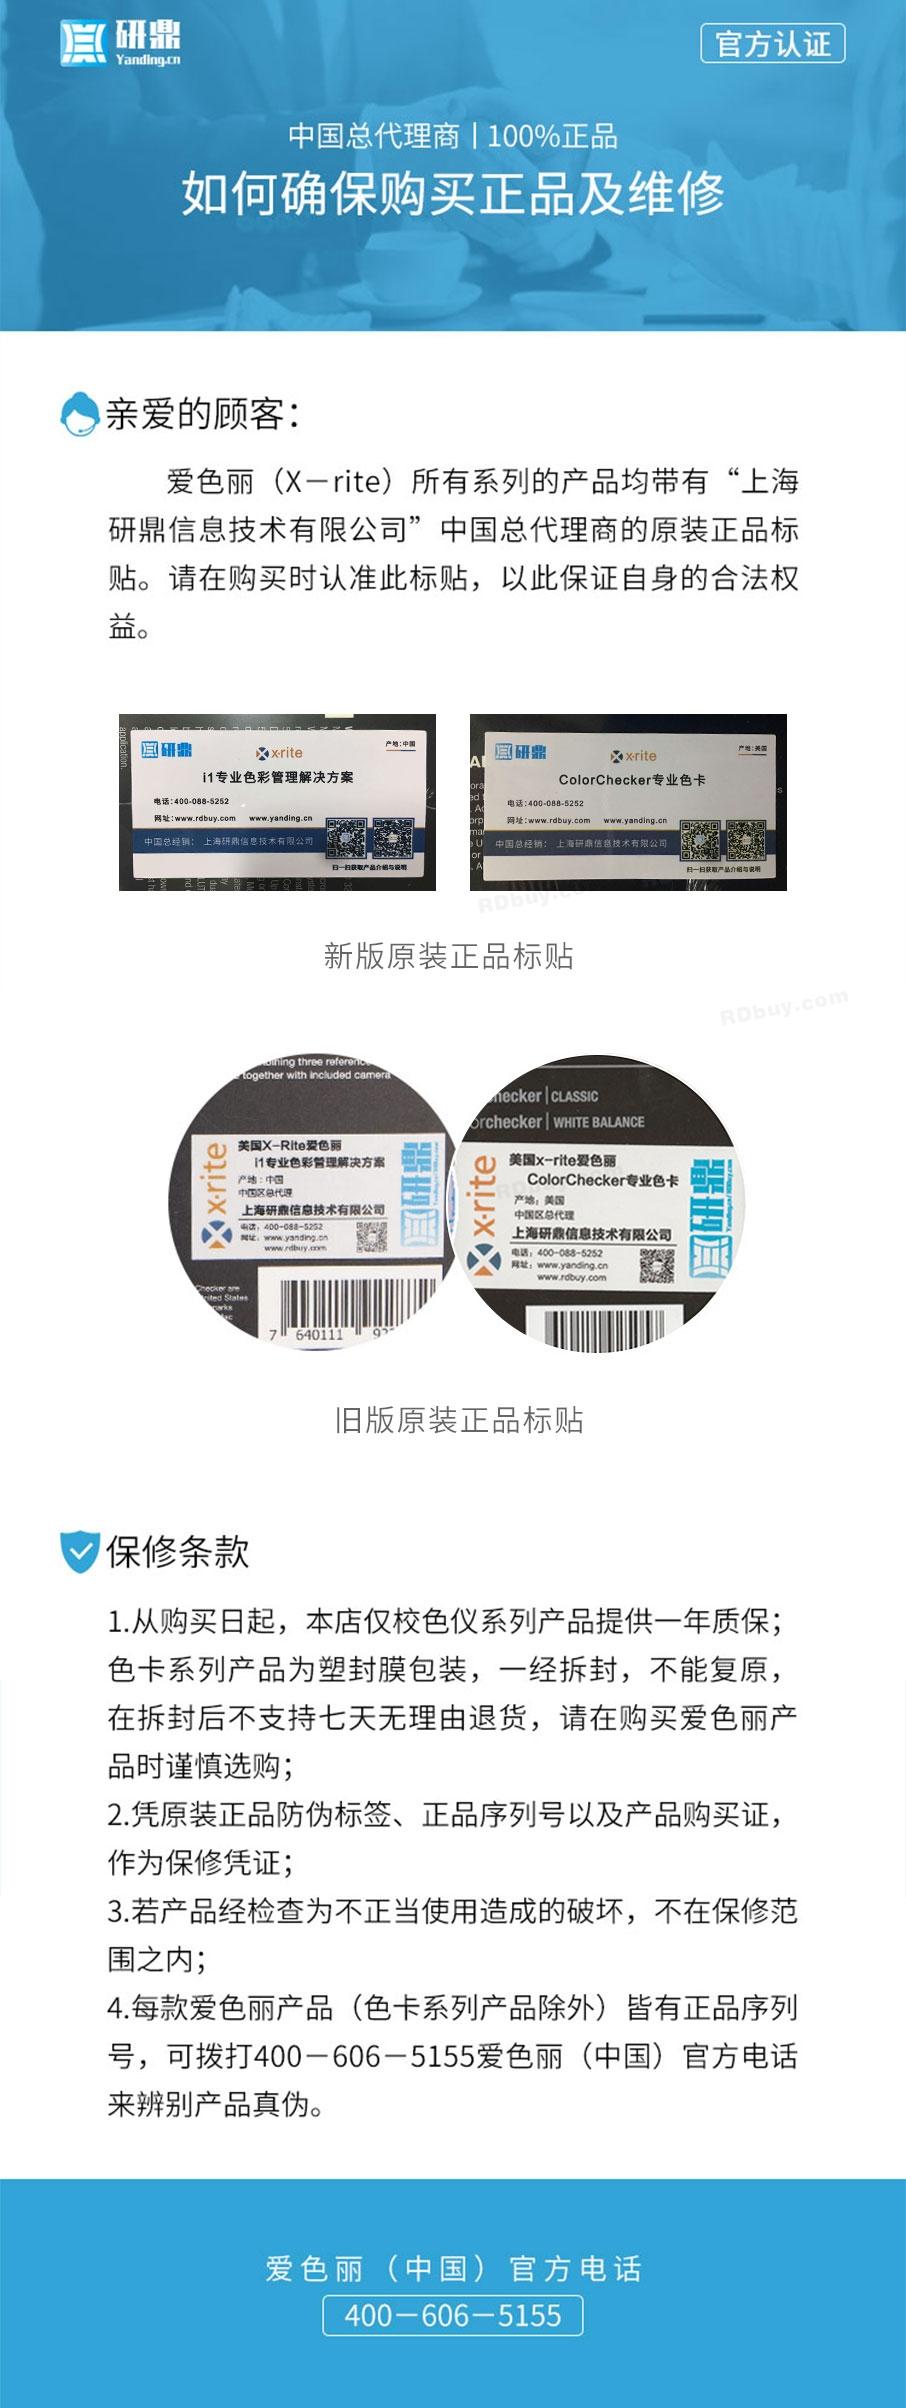 i1-display-pro+二代护照组合套餐---_04.jpg